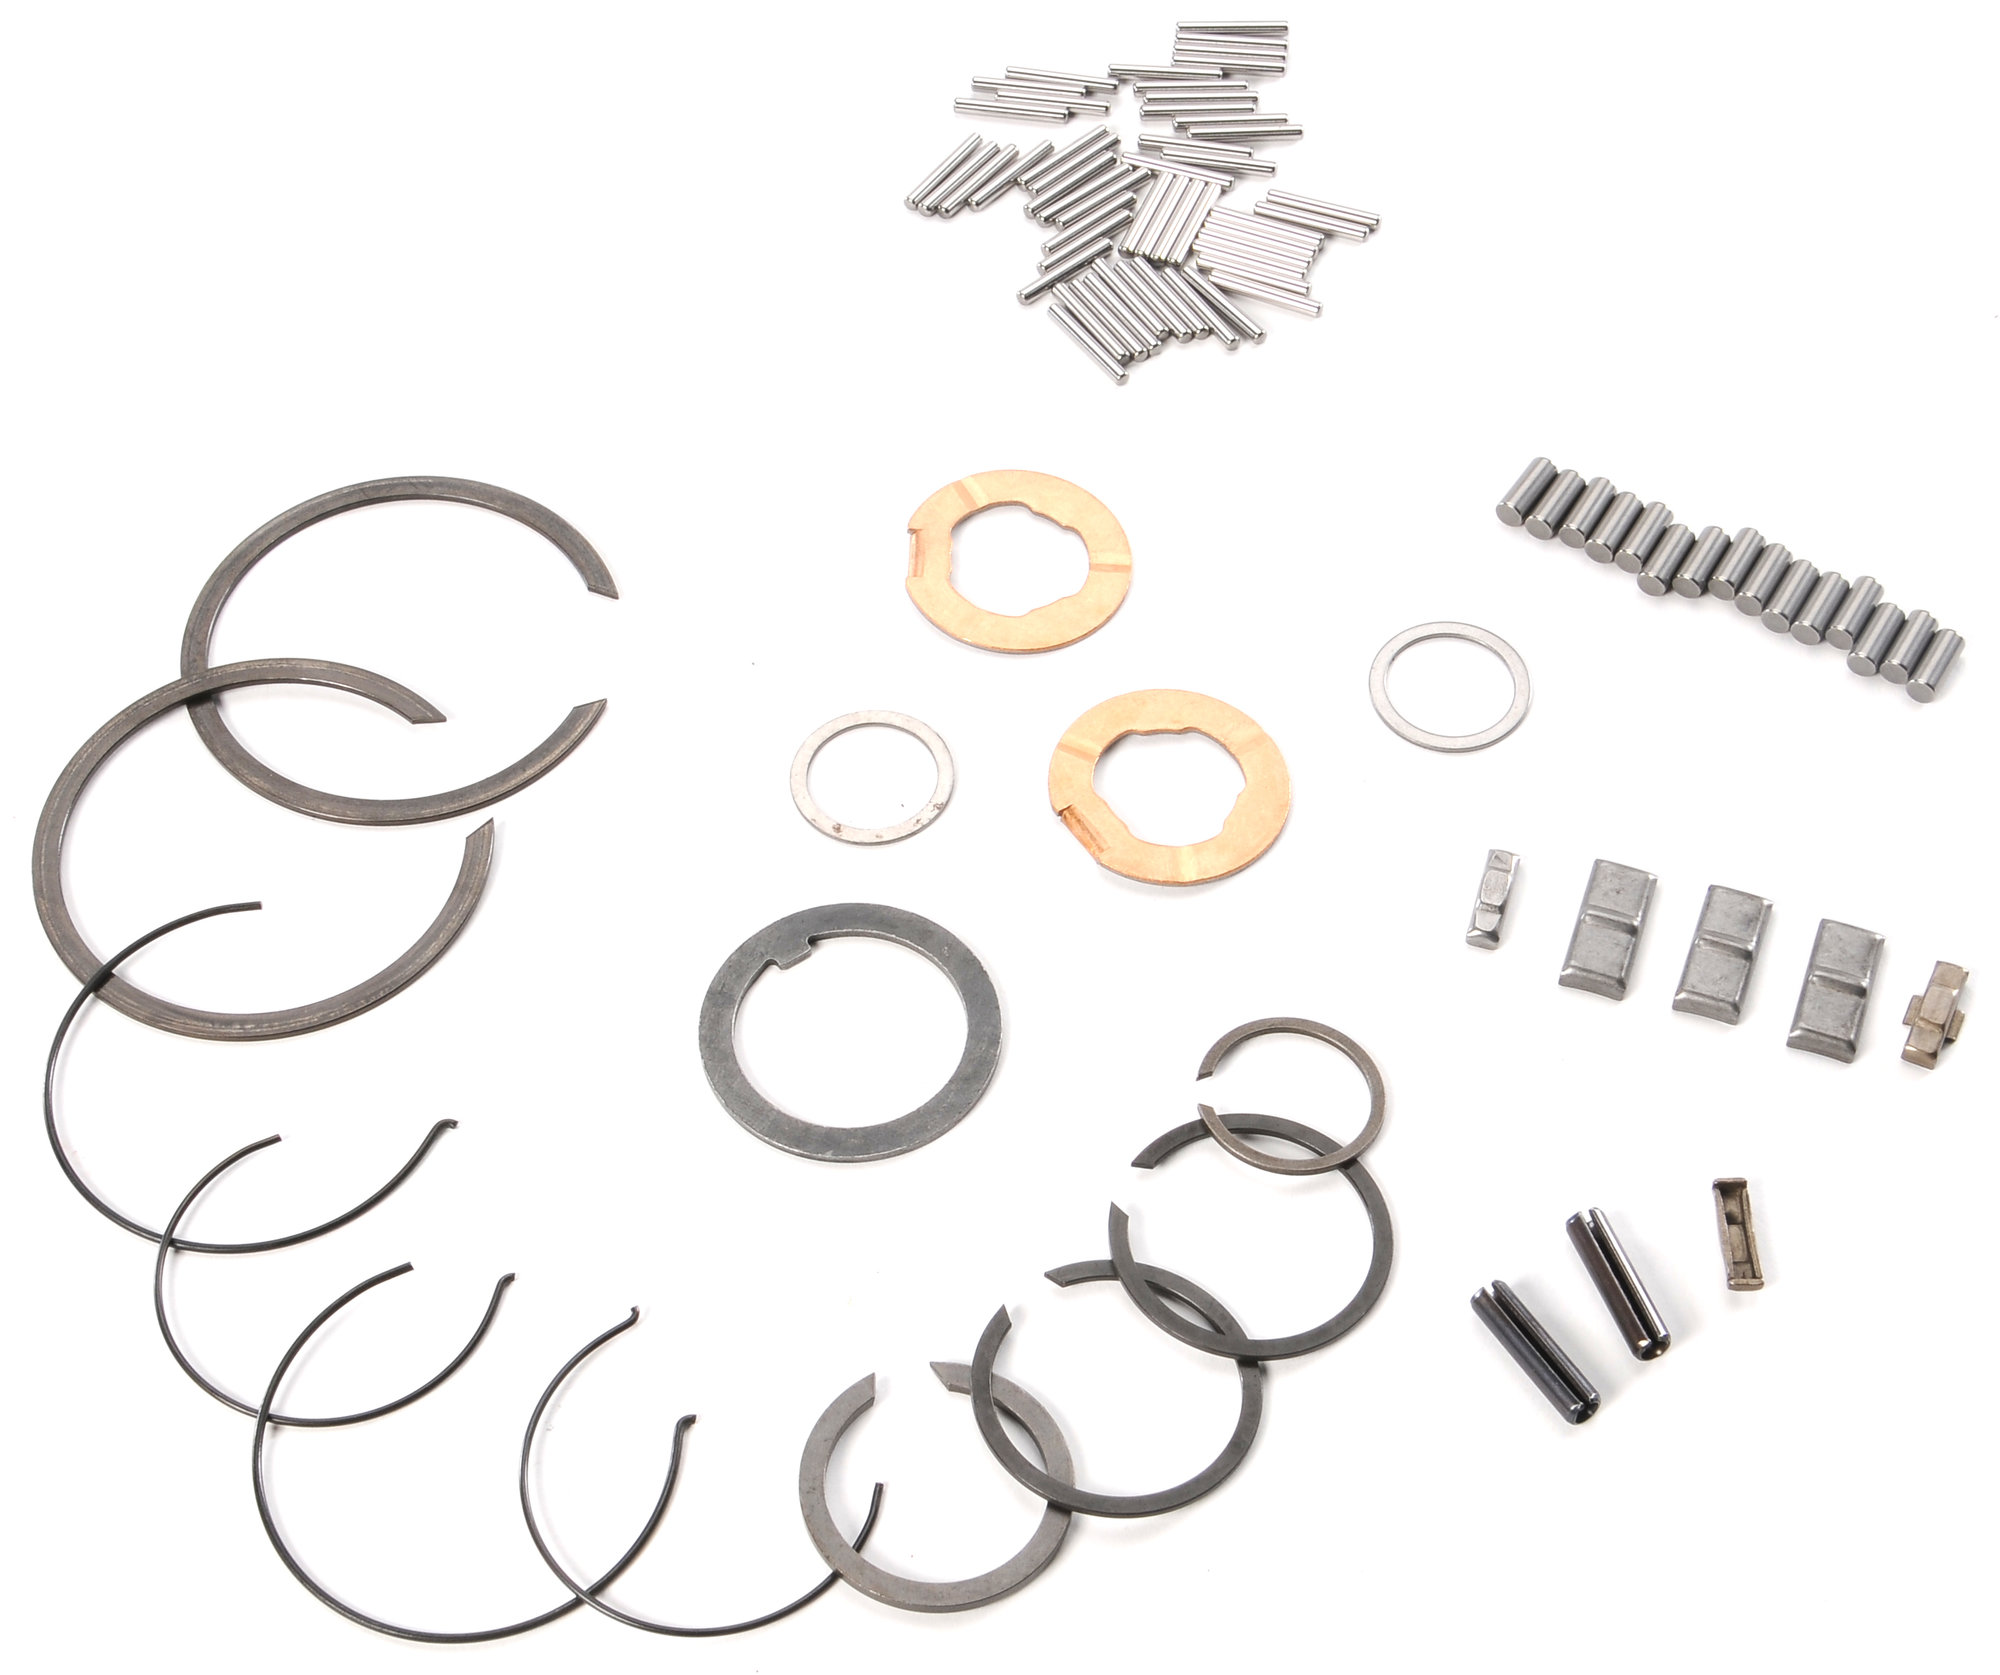 Crown Automotive SR4-50-MK Master Overhaul Small Parts Kit